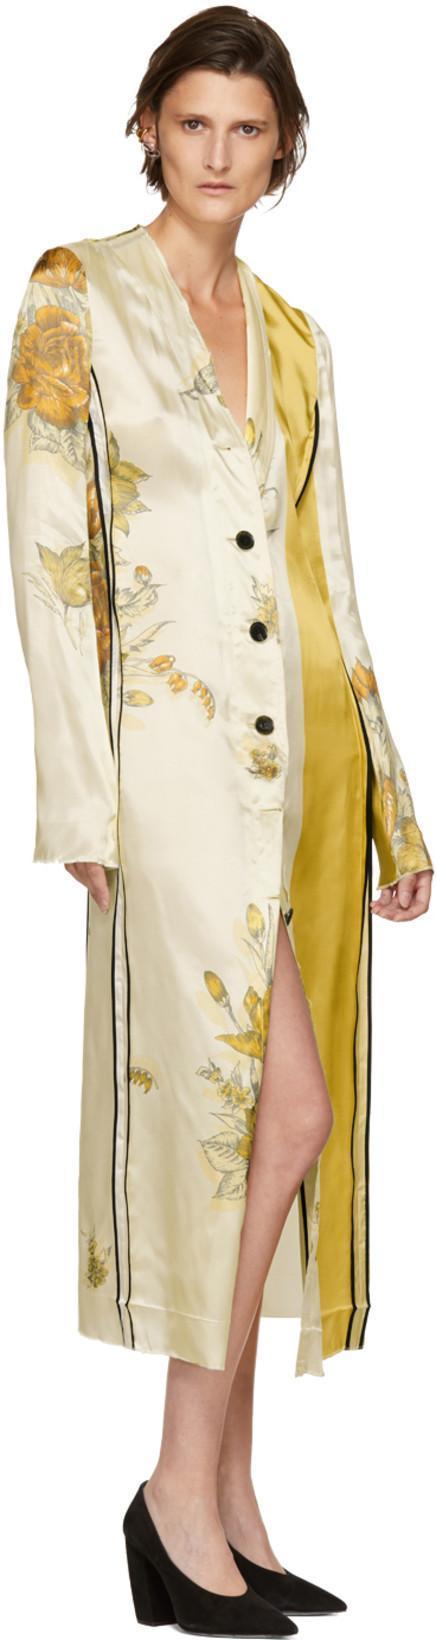 Vallens raw-edge floral-print dress Kwaidan Editions E49TzqpNm